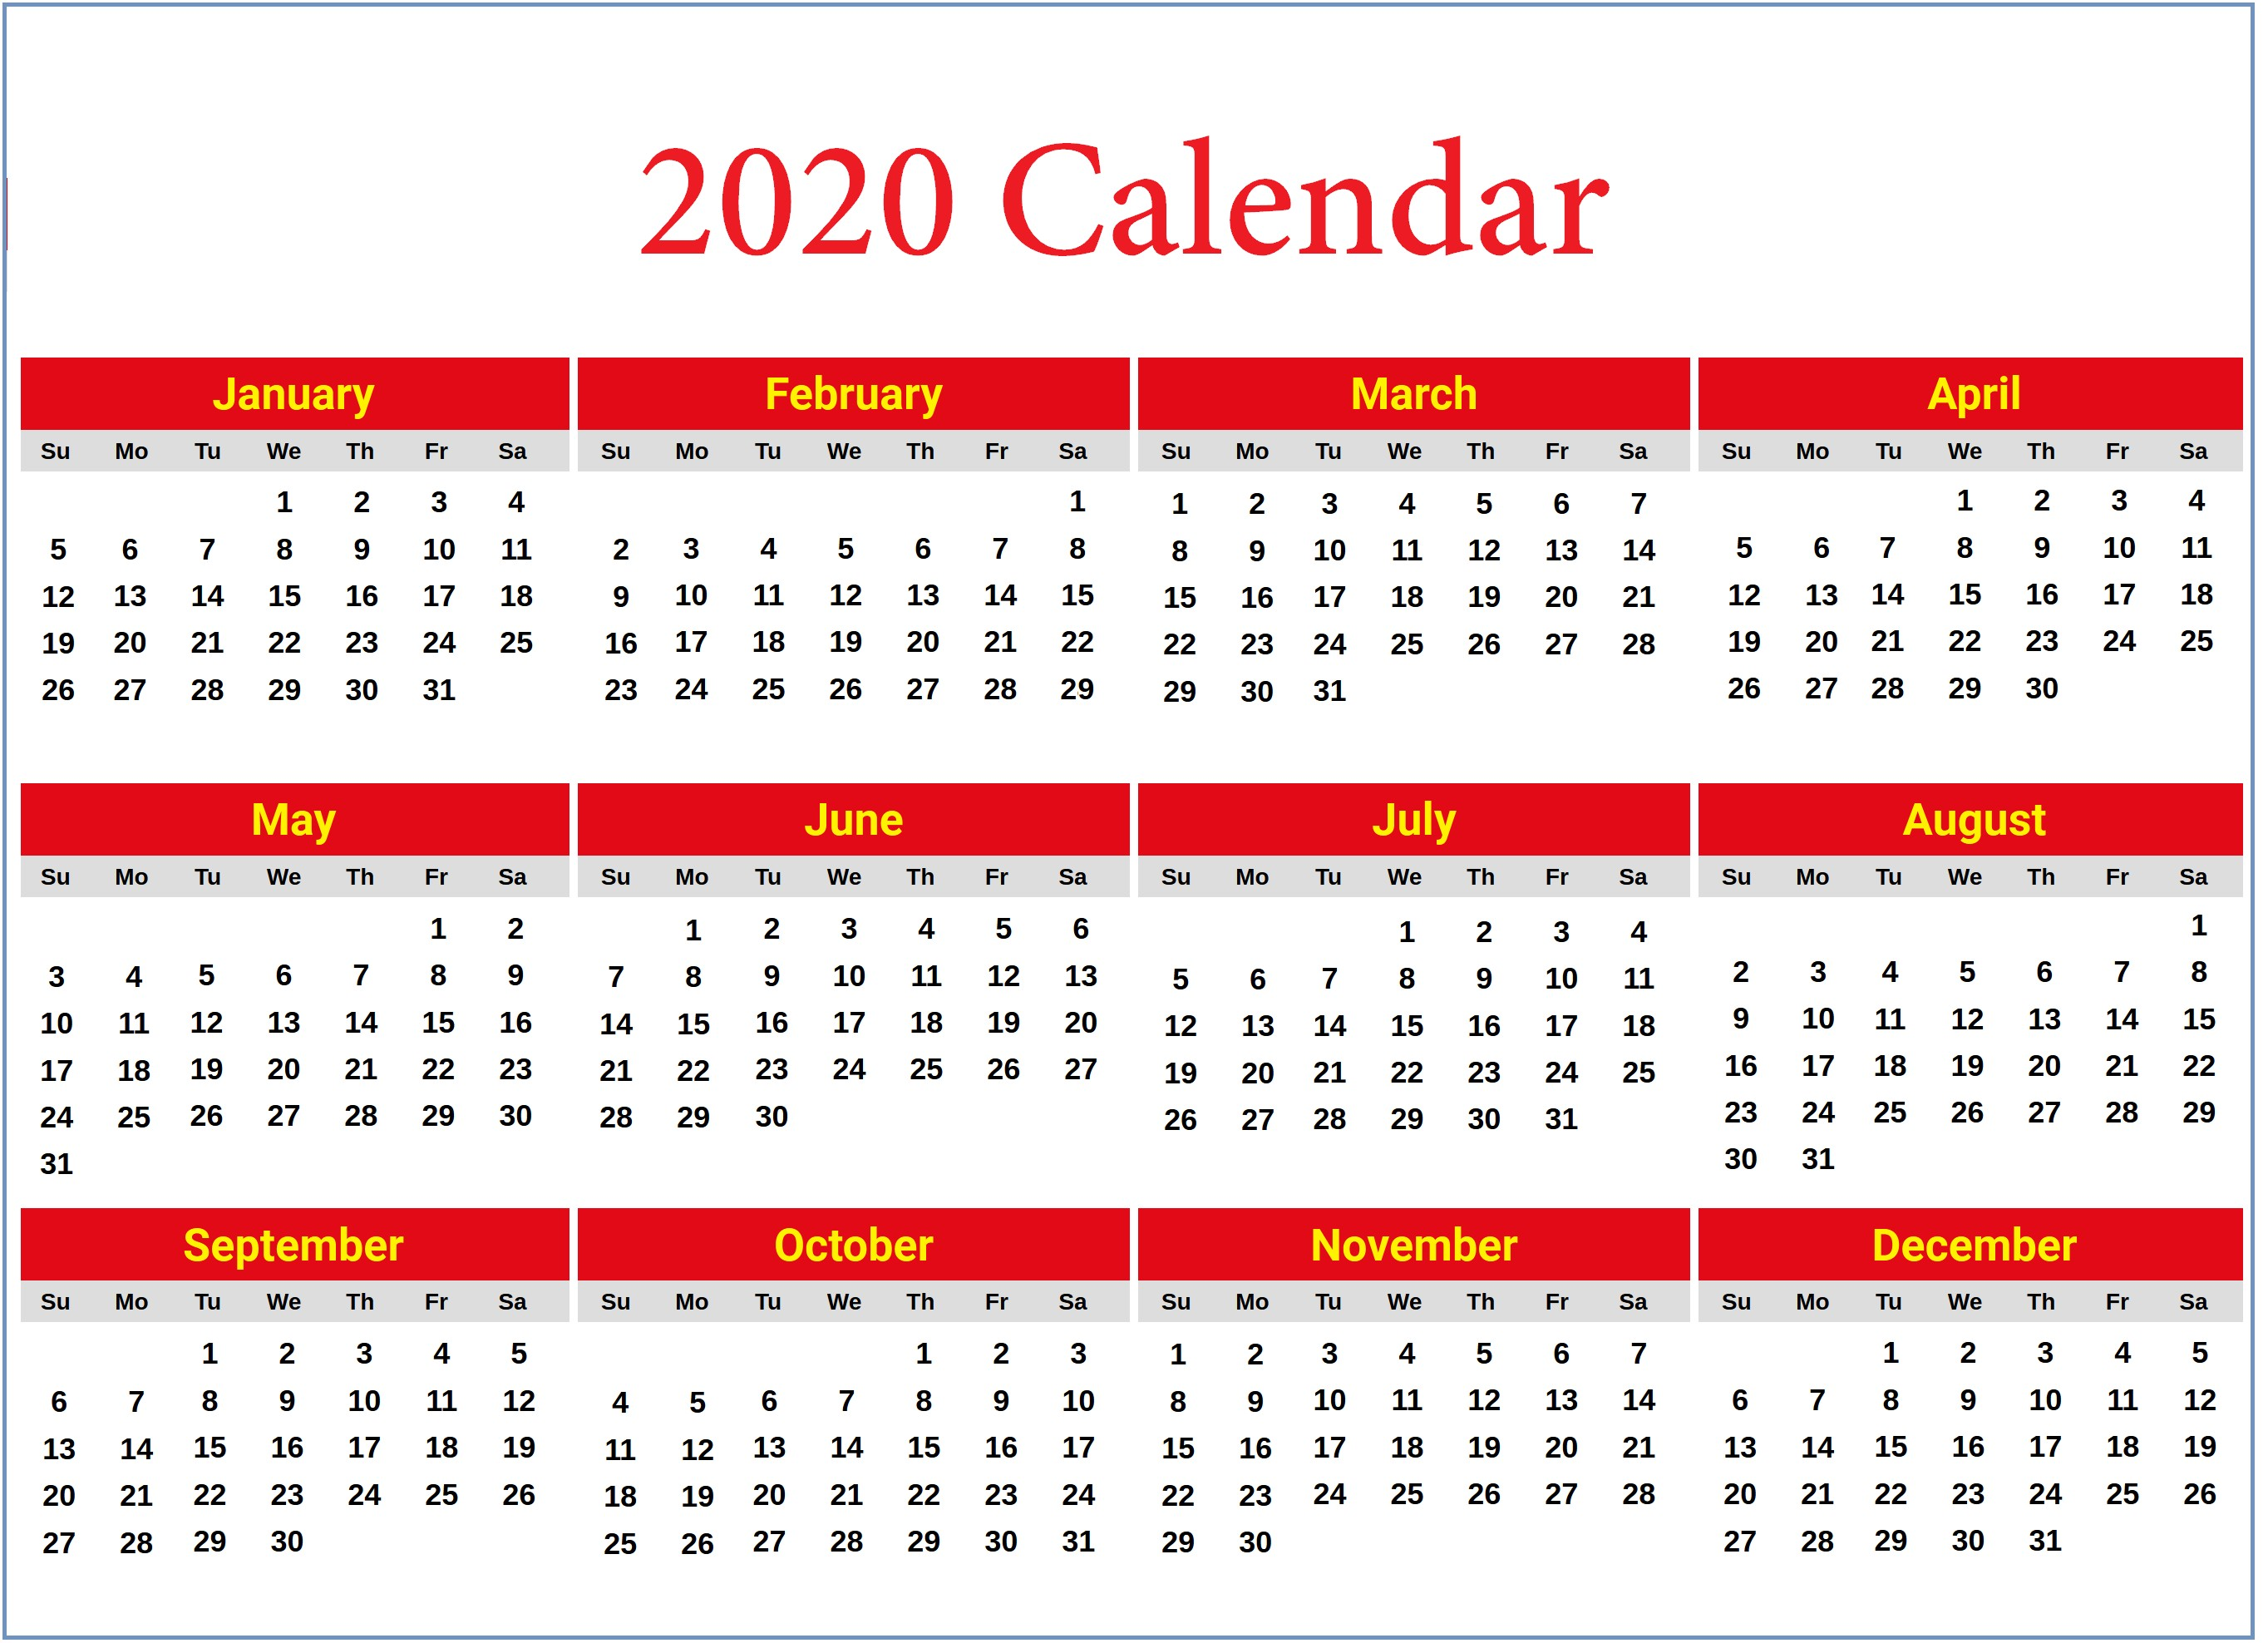 Yearly Calendar Printable 2020 2020 Yearly Calendar Printable